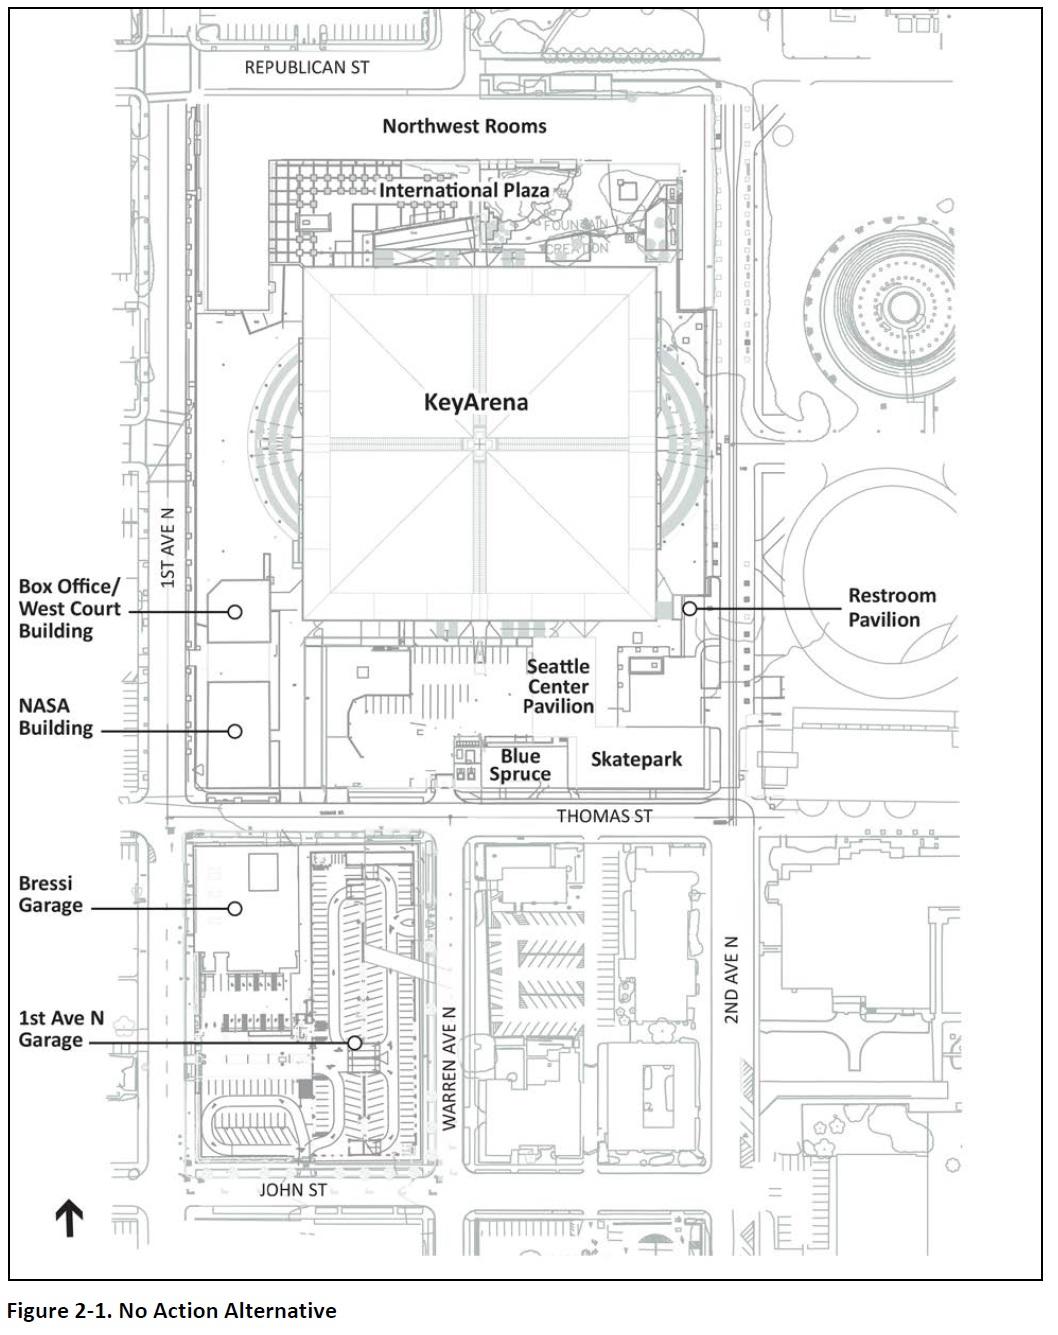 Understanding The Key Arena Renovation Draft Eis